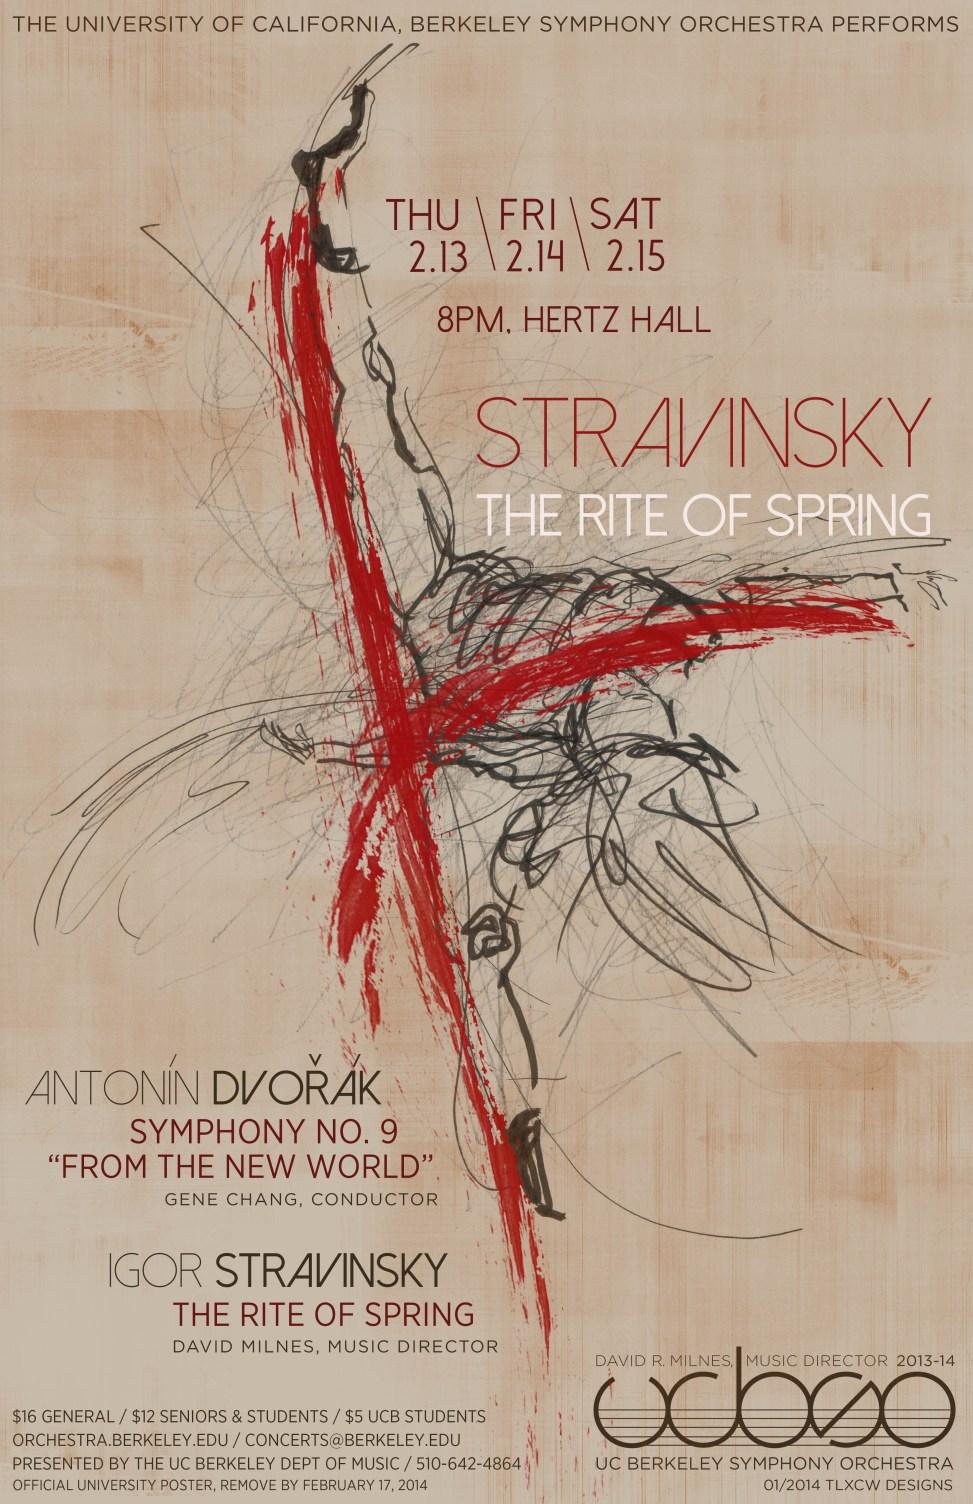 UCBSO - Stravinsky